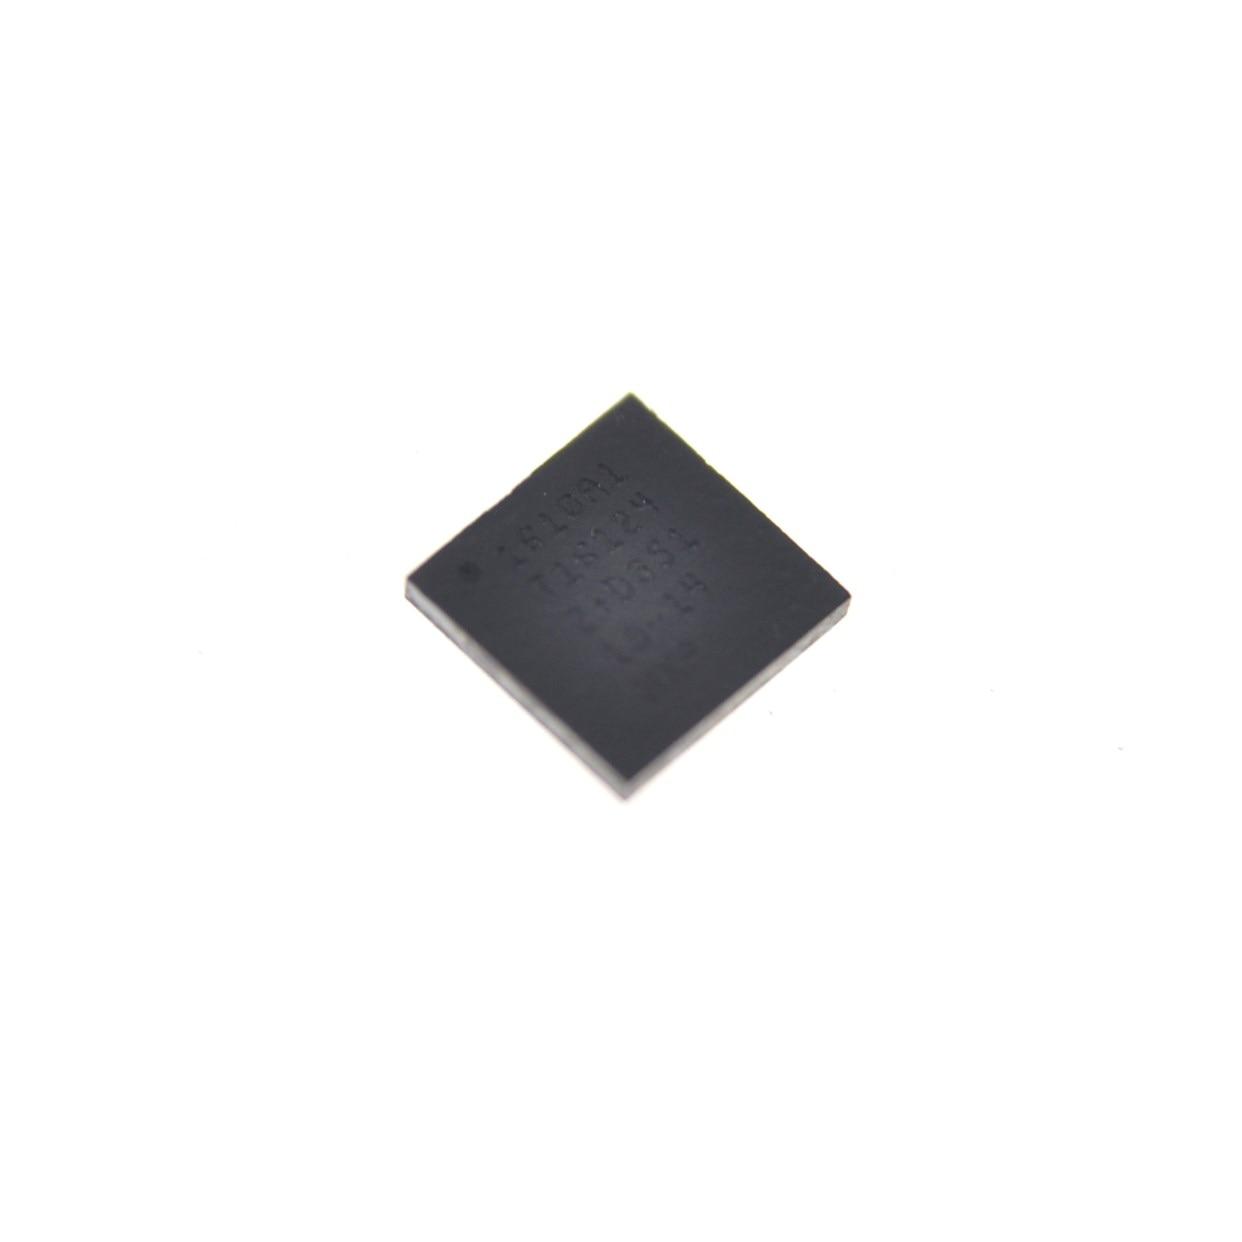 10 unids/lote 100% Original cargador nuevo chip de carga ic para iPhone 6 6G 6 plus usb ic chip 1610 1610A 1610A2 36pin